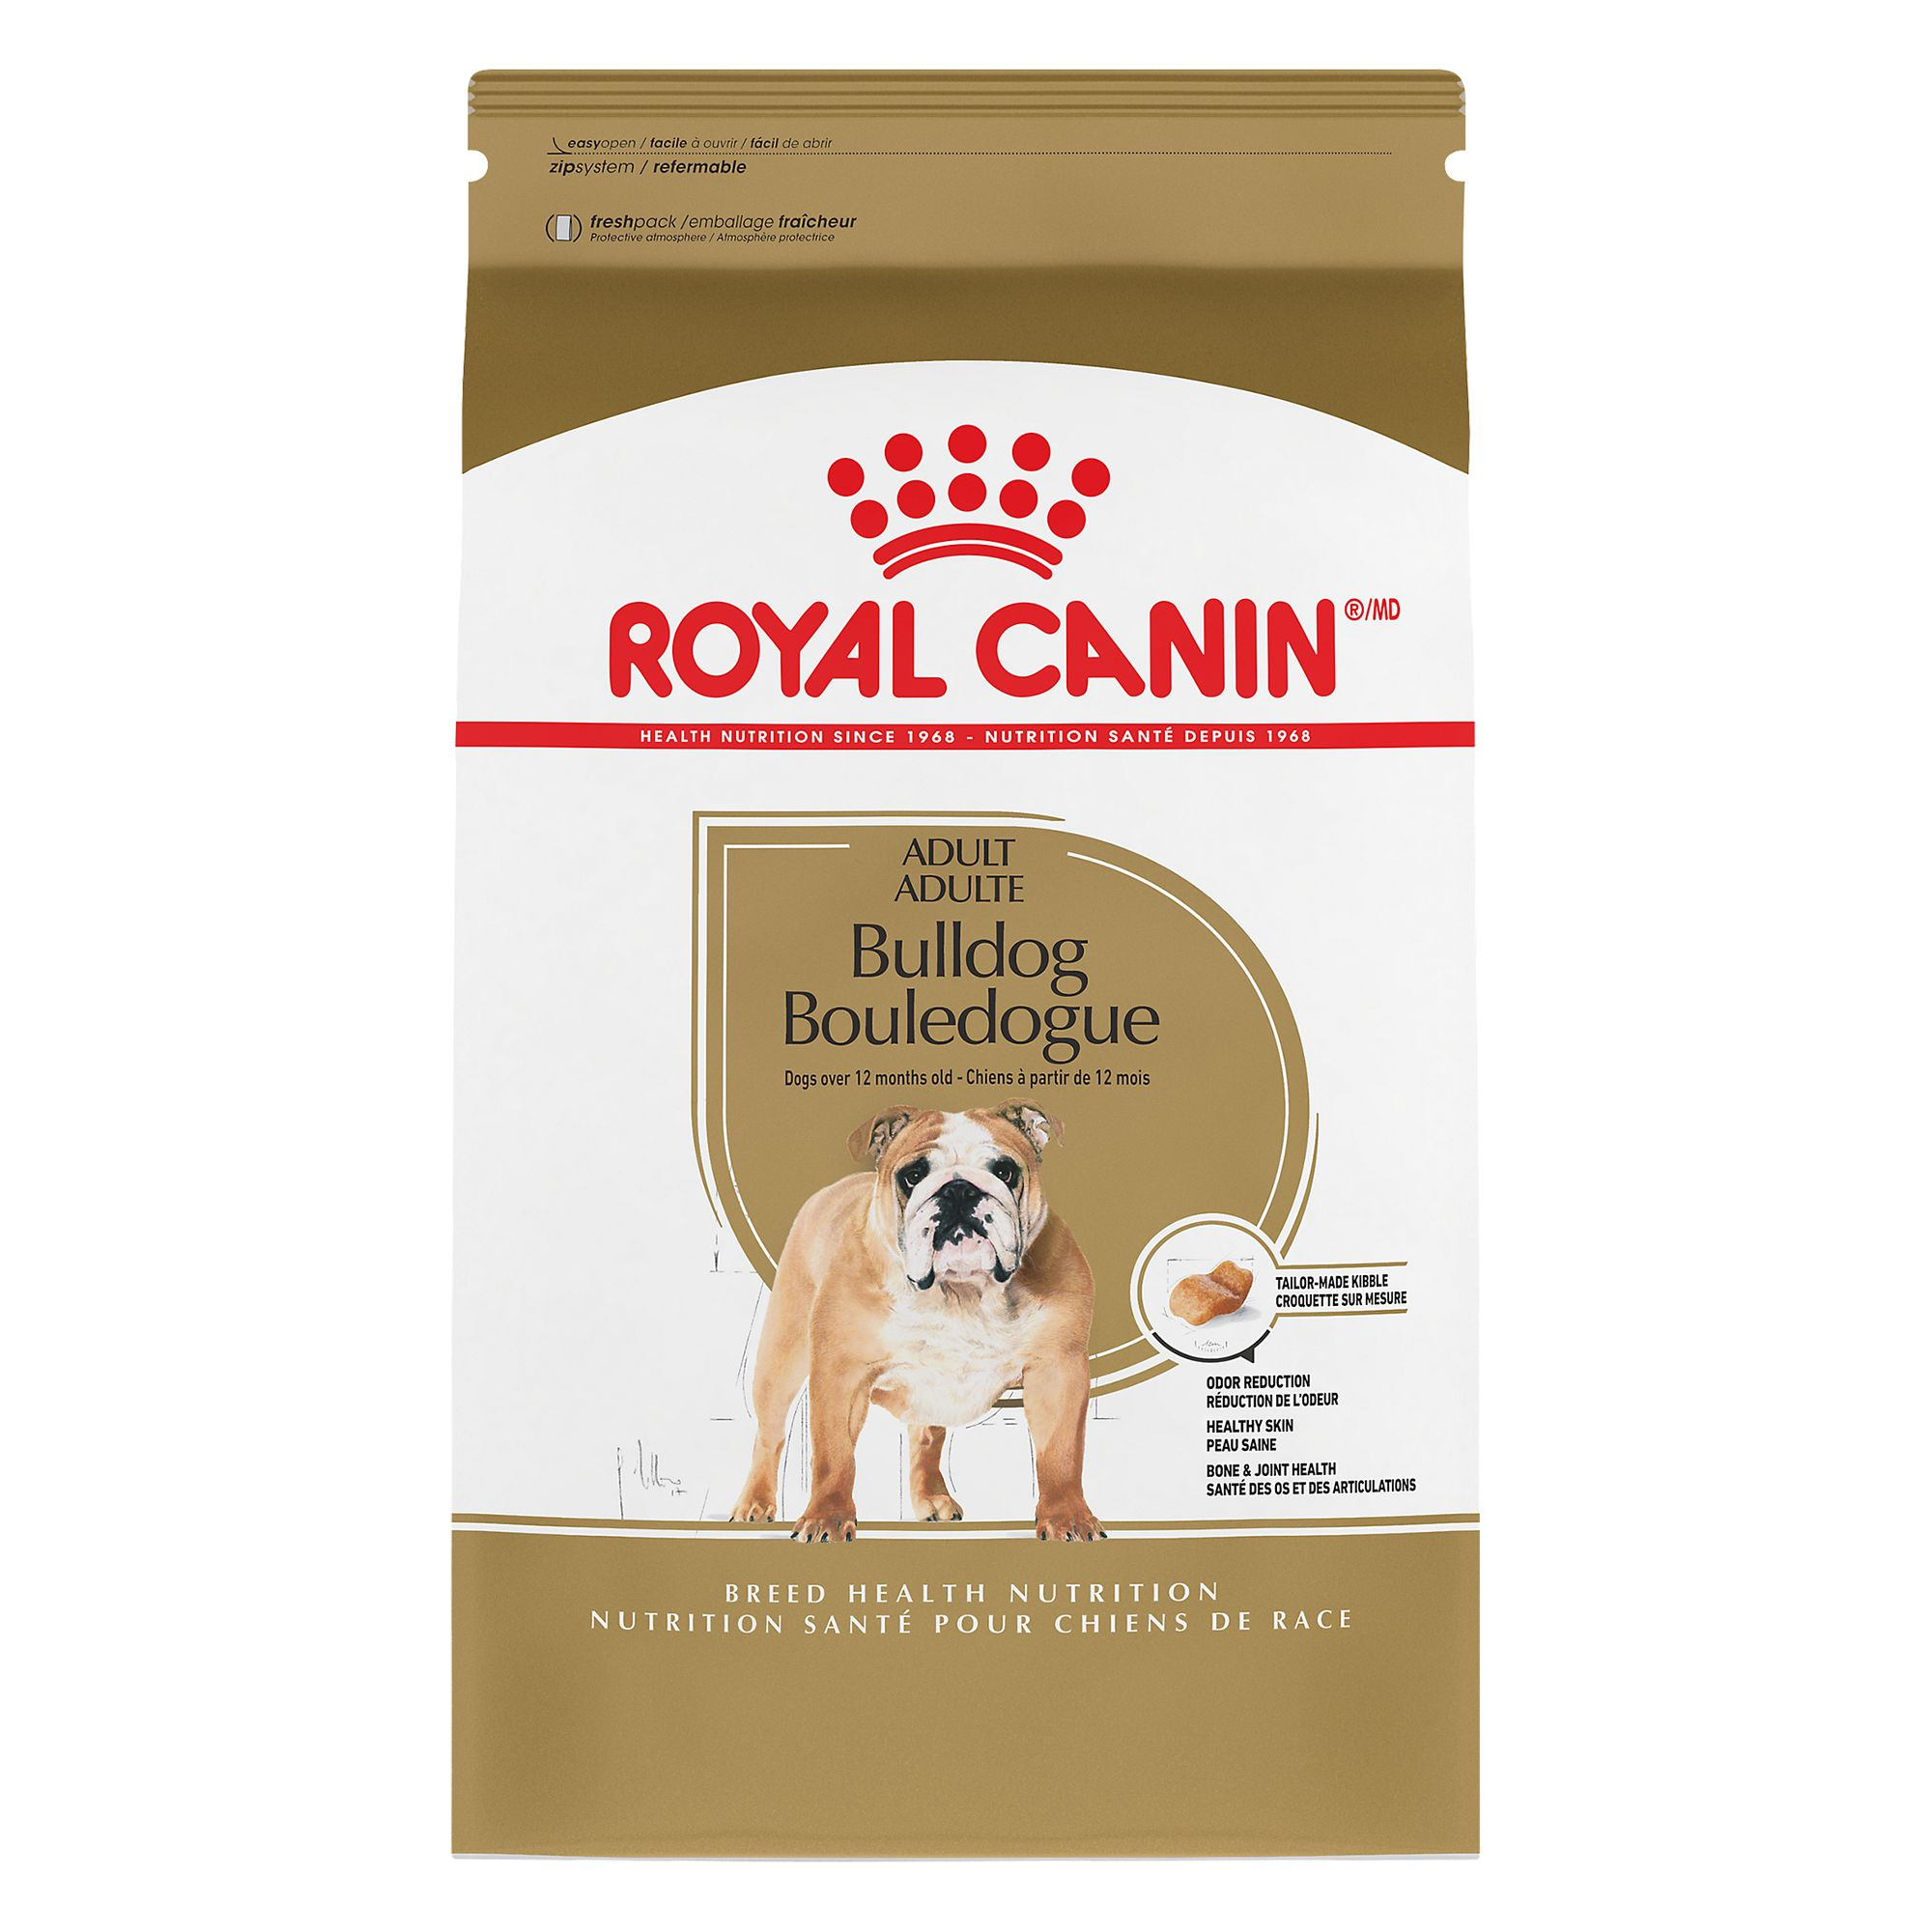 royal canin club pro energy he adult high energy kibble 20kg. Black Bedroom Furniture Sets. Home Design Ideas